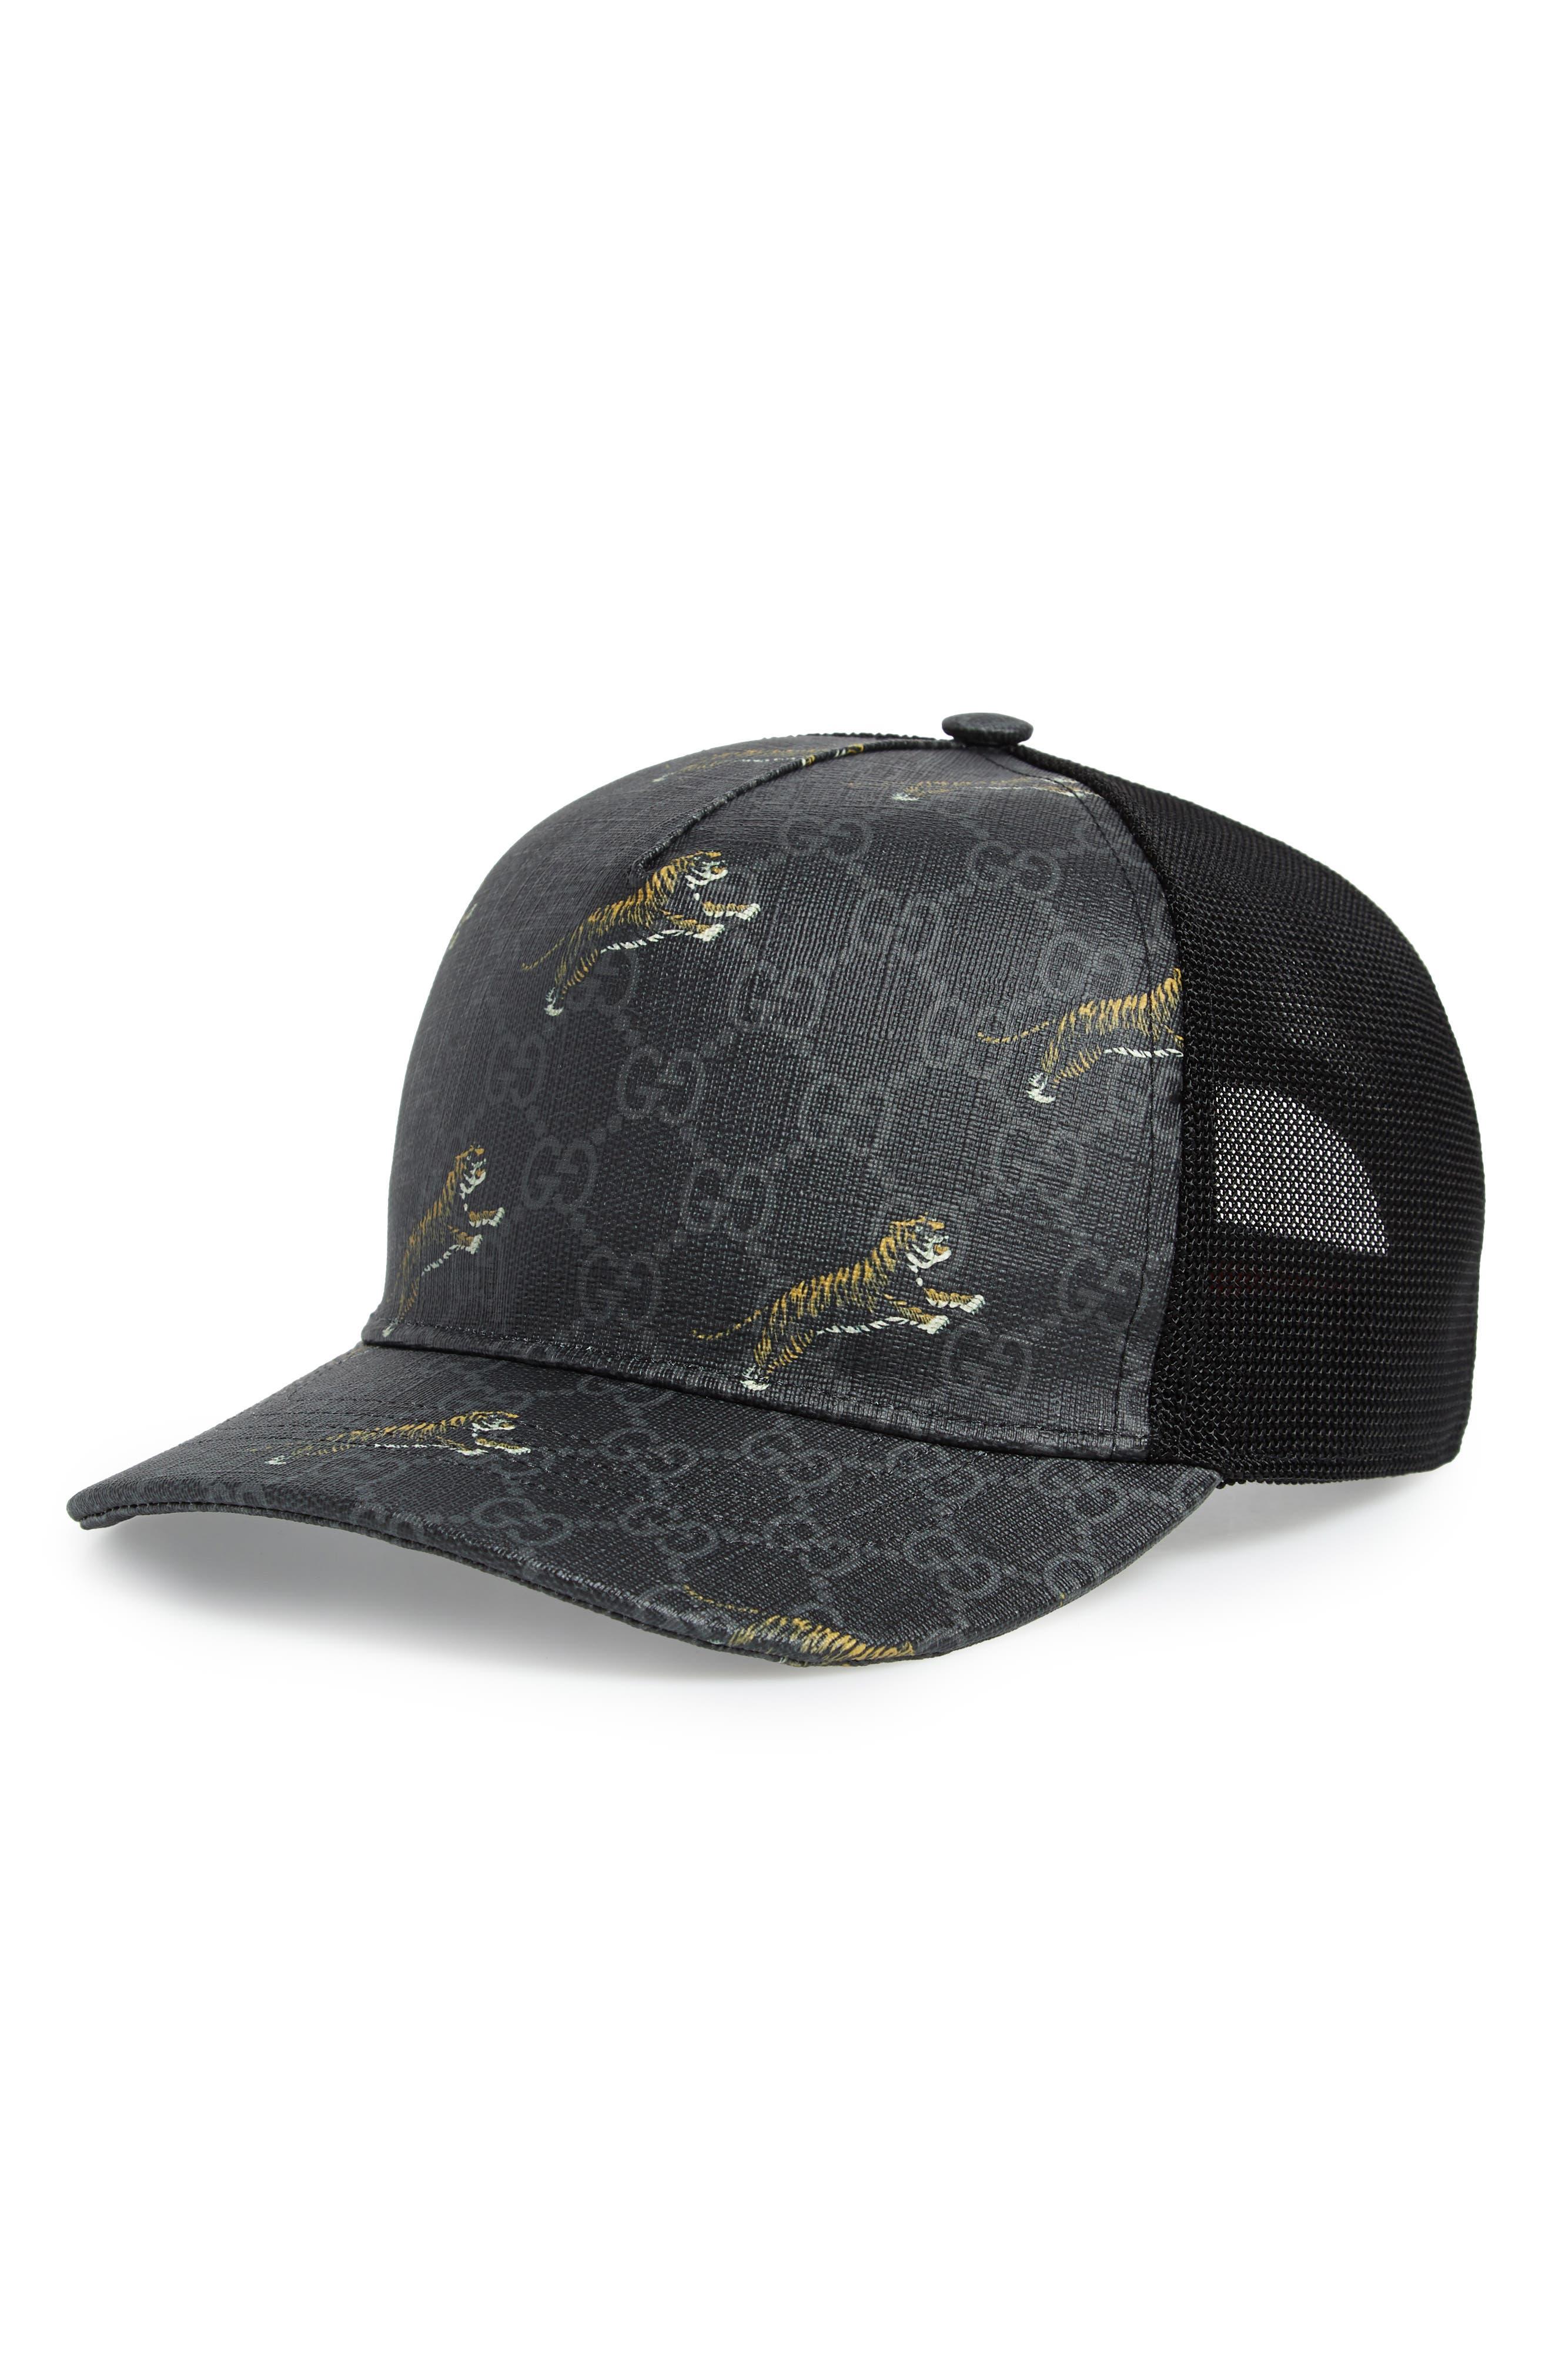 b879b2868 Men's Hats, Hats for Men   Nordstrom